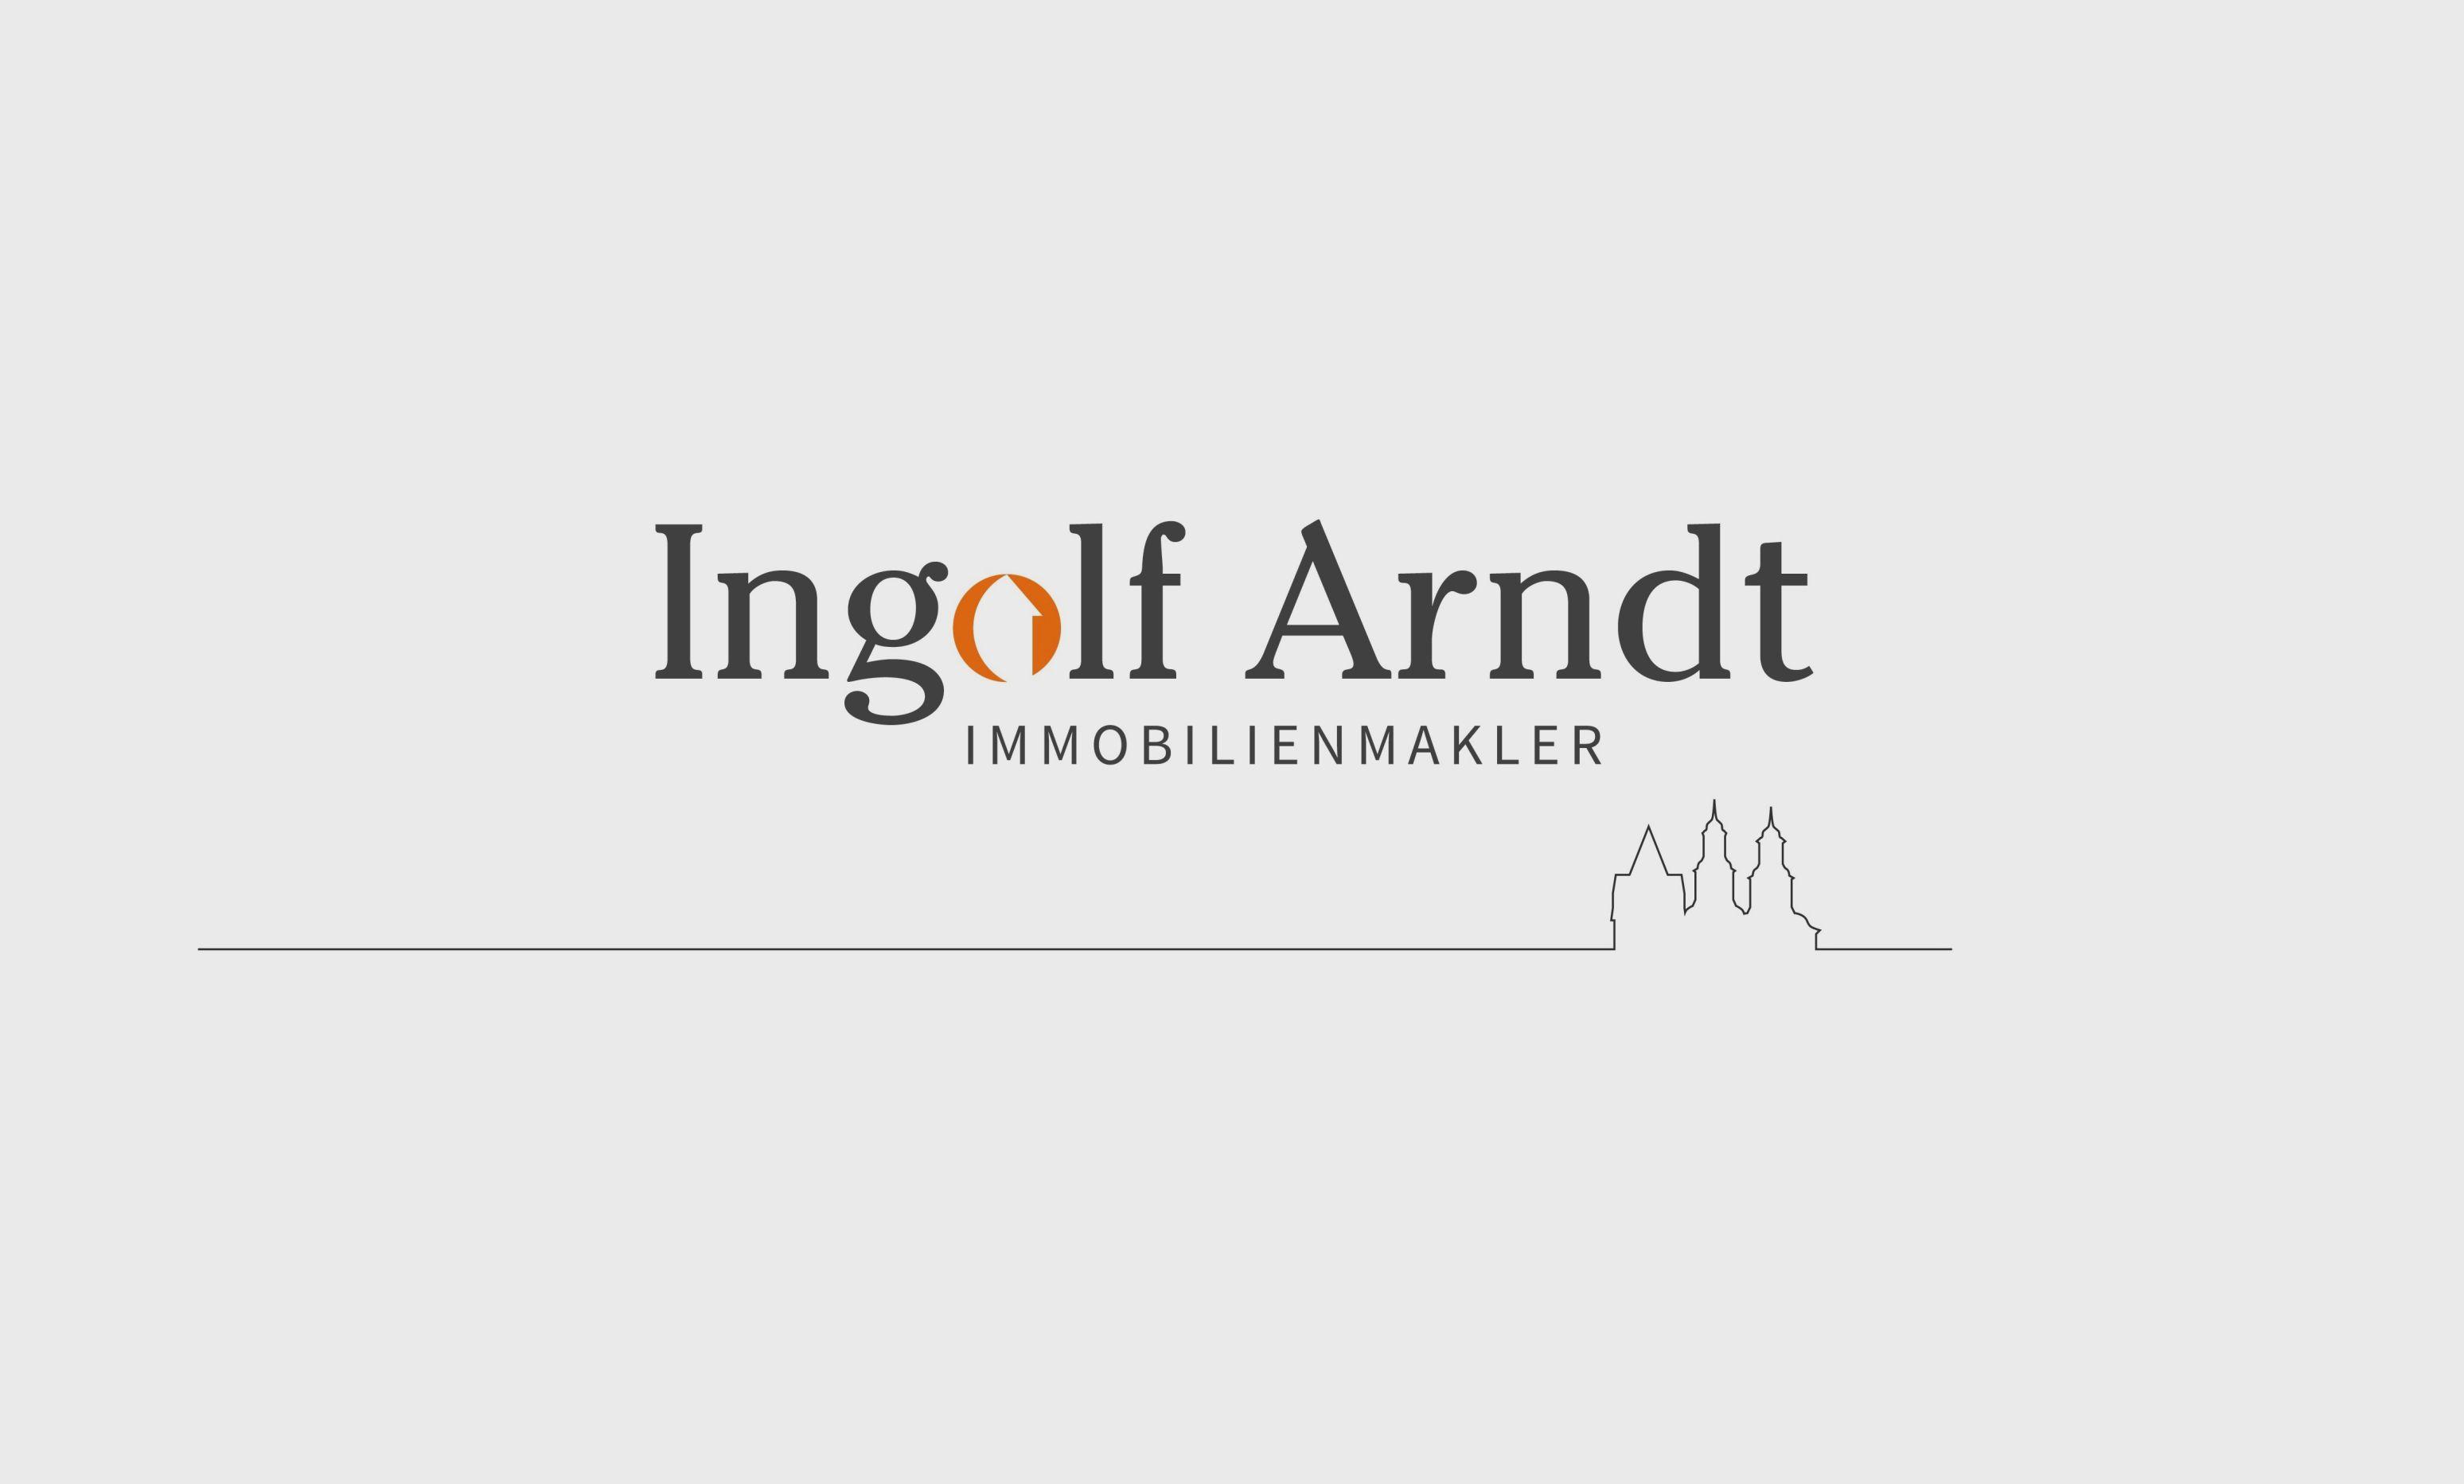 Immobilienmakler Ingolf Arndt